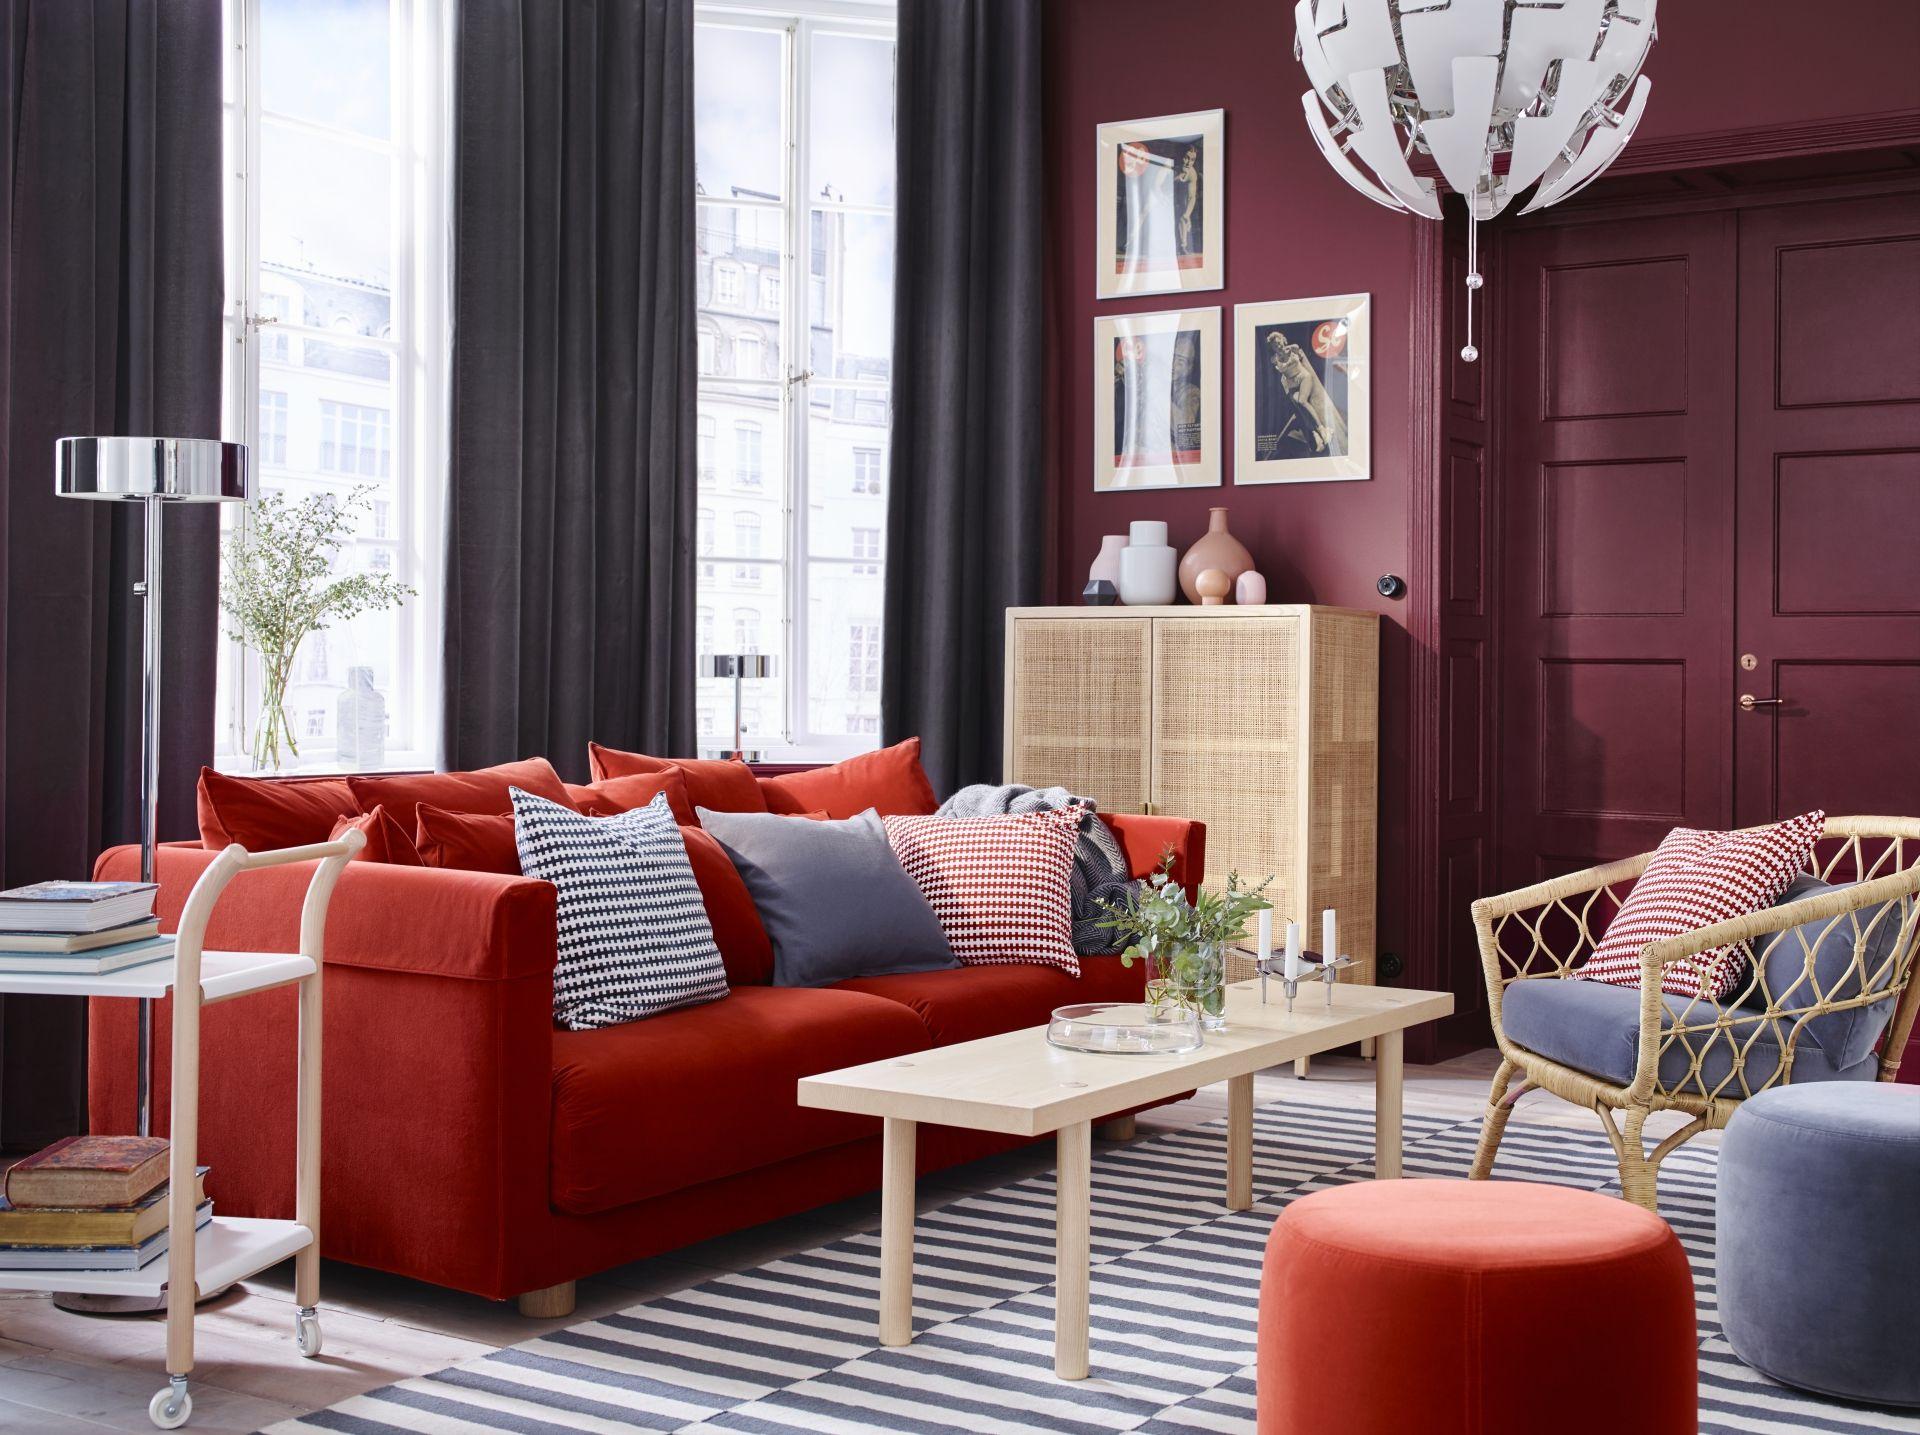 Rode Kussens Ikea : Stockholm 2017 kussen blauw wit salon living room decor ikea